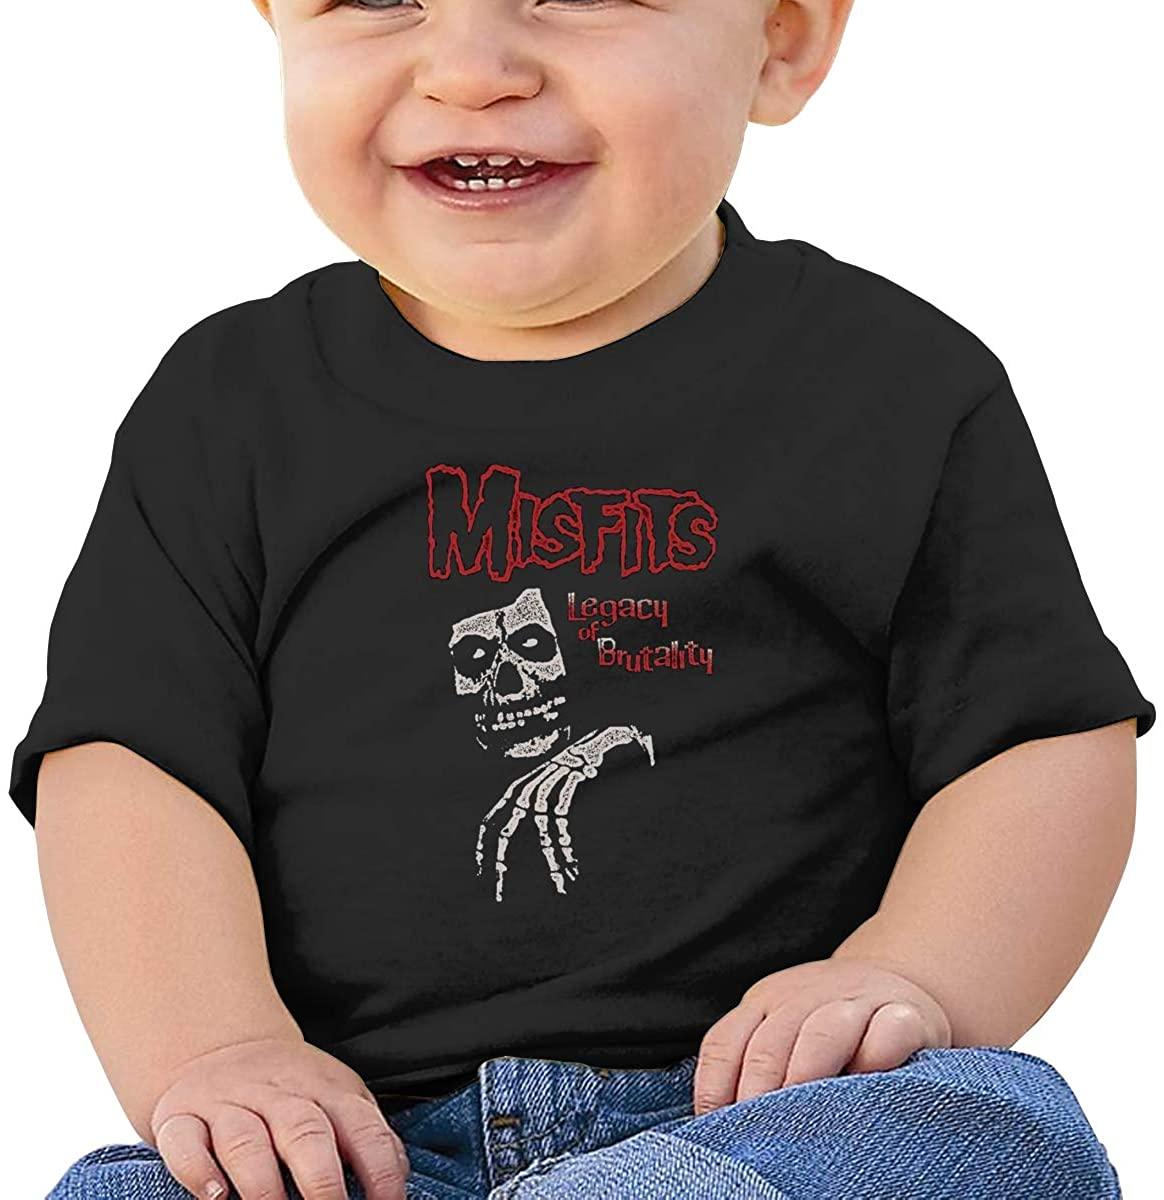 6-24 Months Boy and Girl Baby Short Sleeve T-Shirt Misfits Original Minimalist Style Black